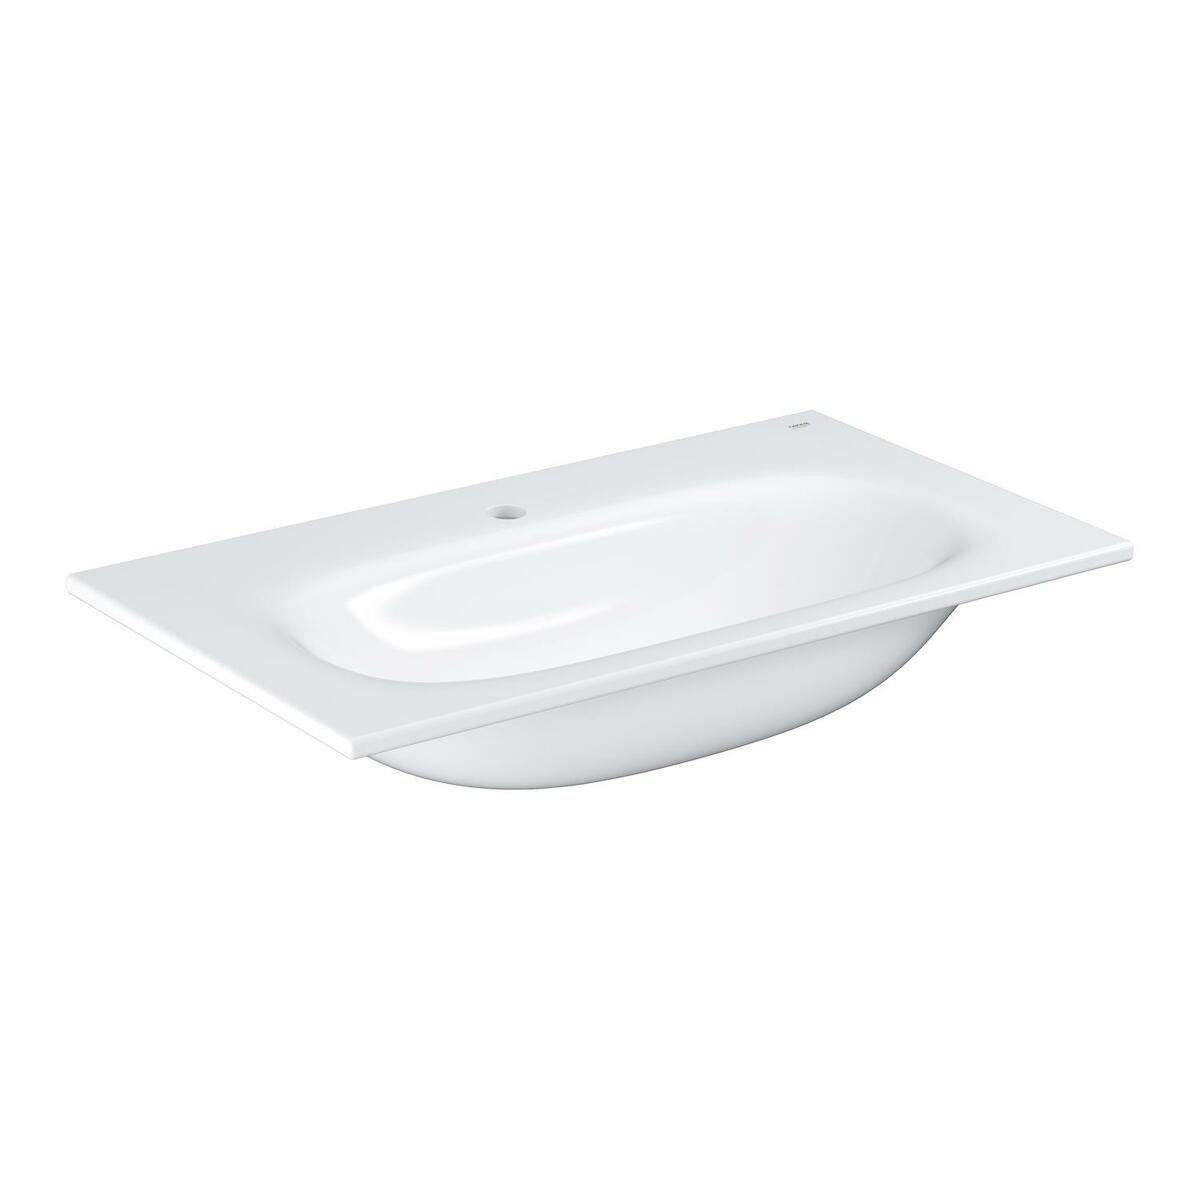 Umývadlo Grohe Essence Ceramic 80x46 cm alpská biela otvor pre batériu uprostred 3956700H